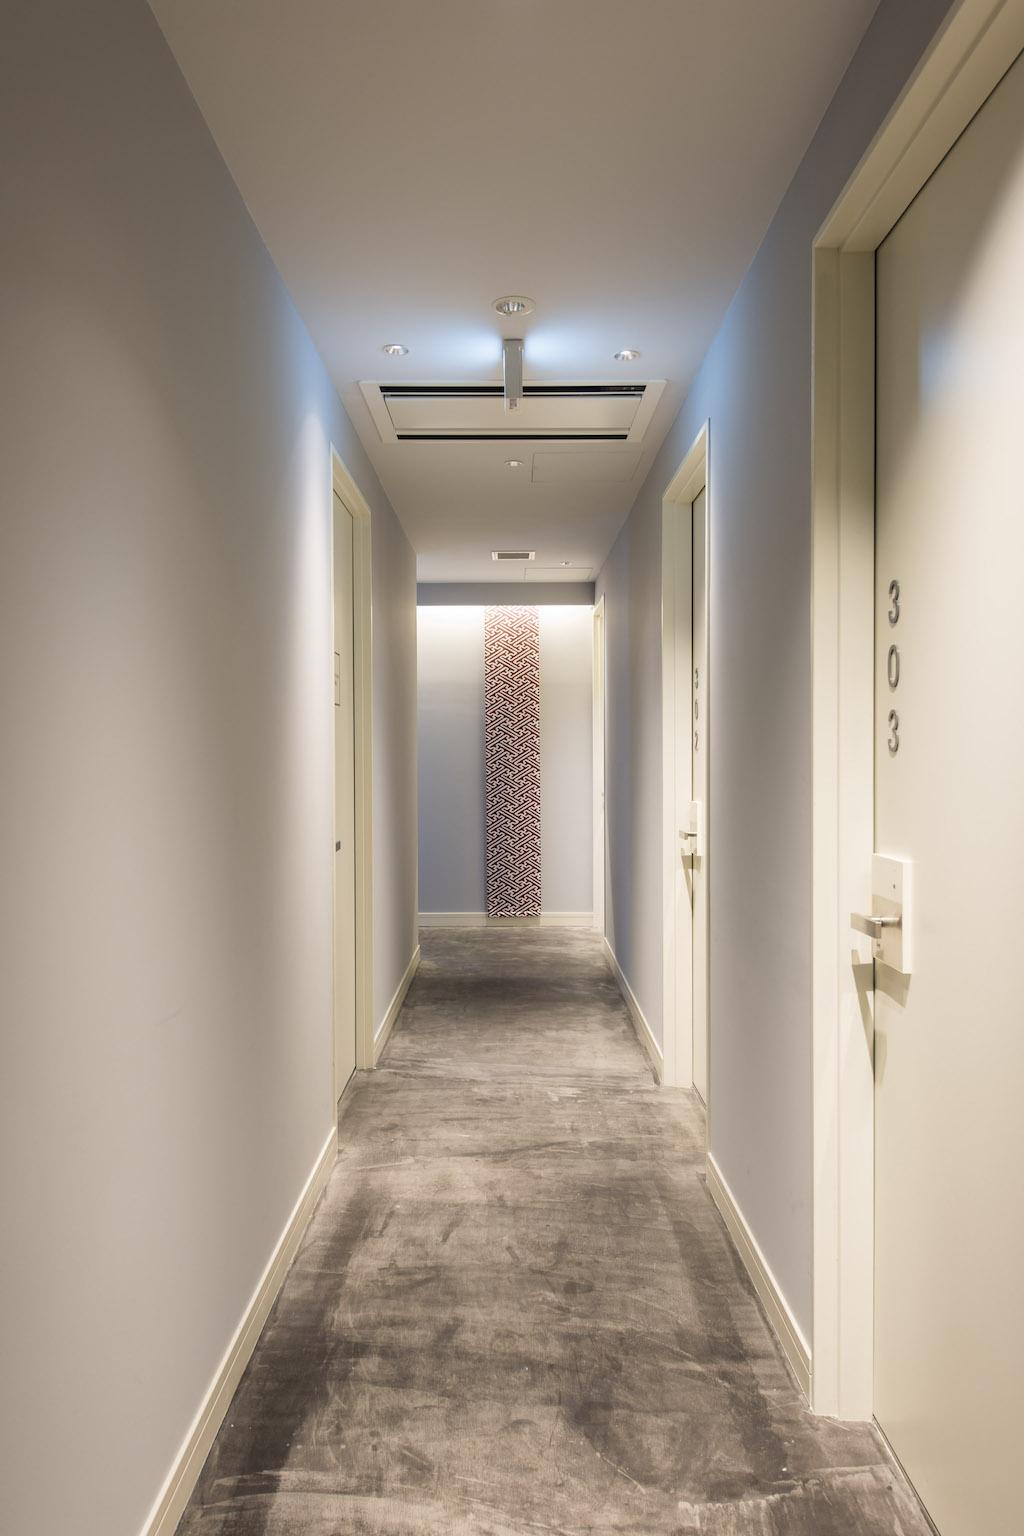 Grids Hotel + Hostel Nihombashi Hallway